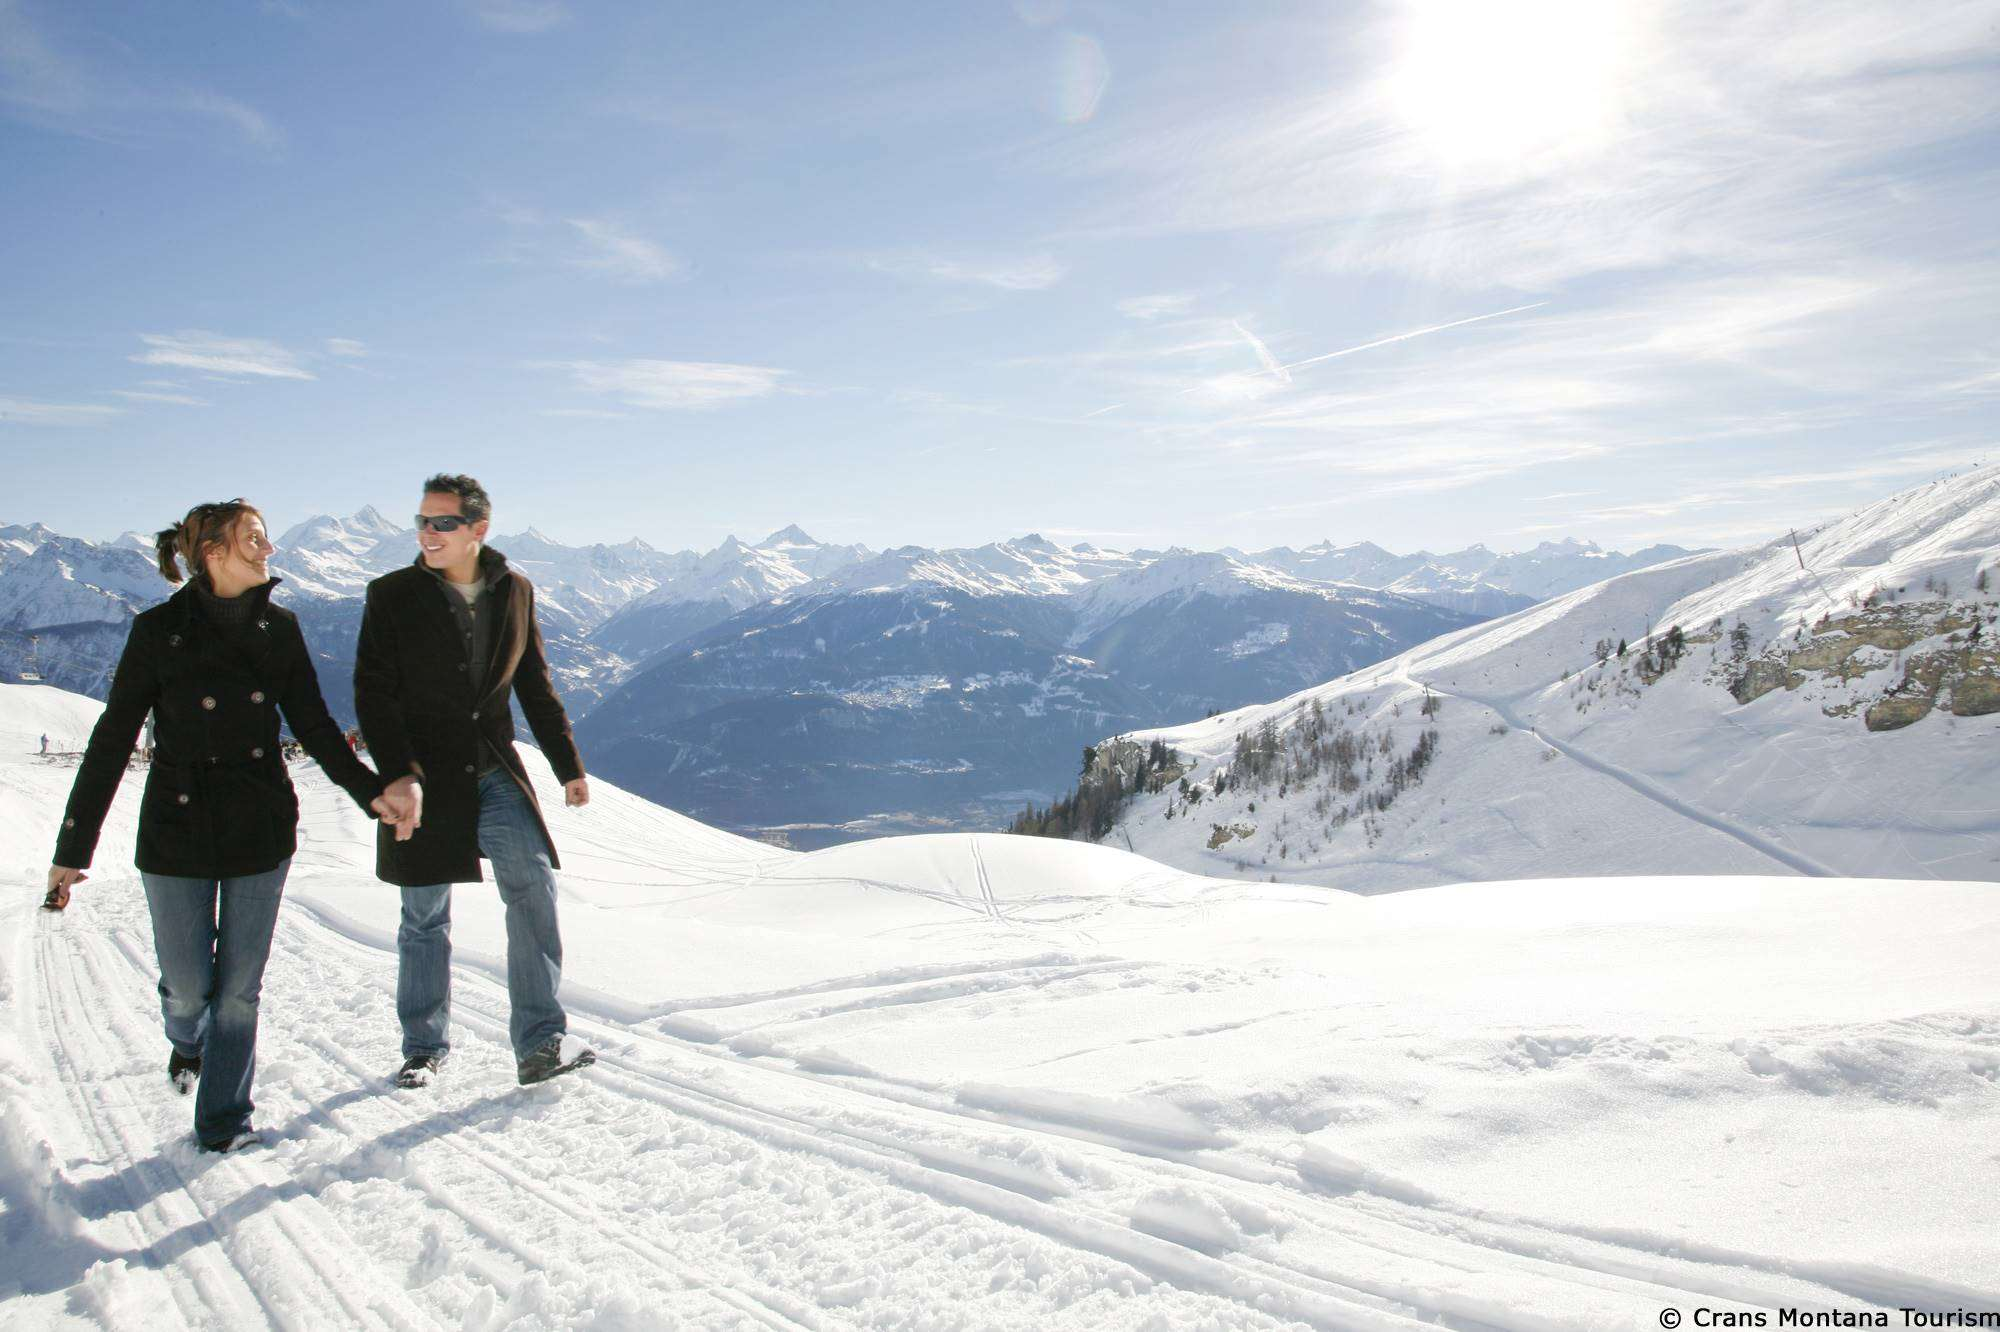 Crans Montana Skiing holidays Ski holiday Crans Montana